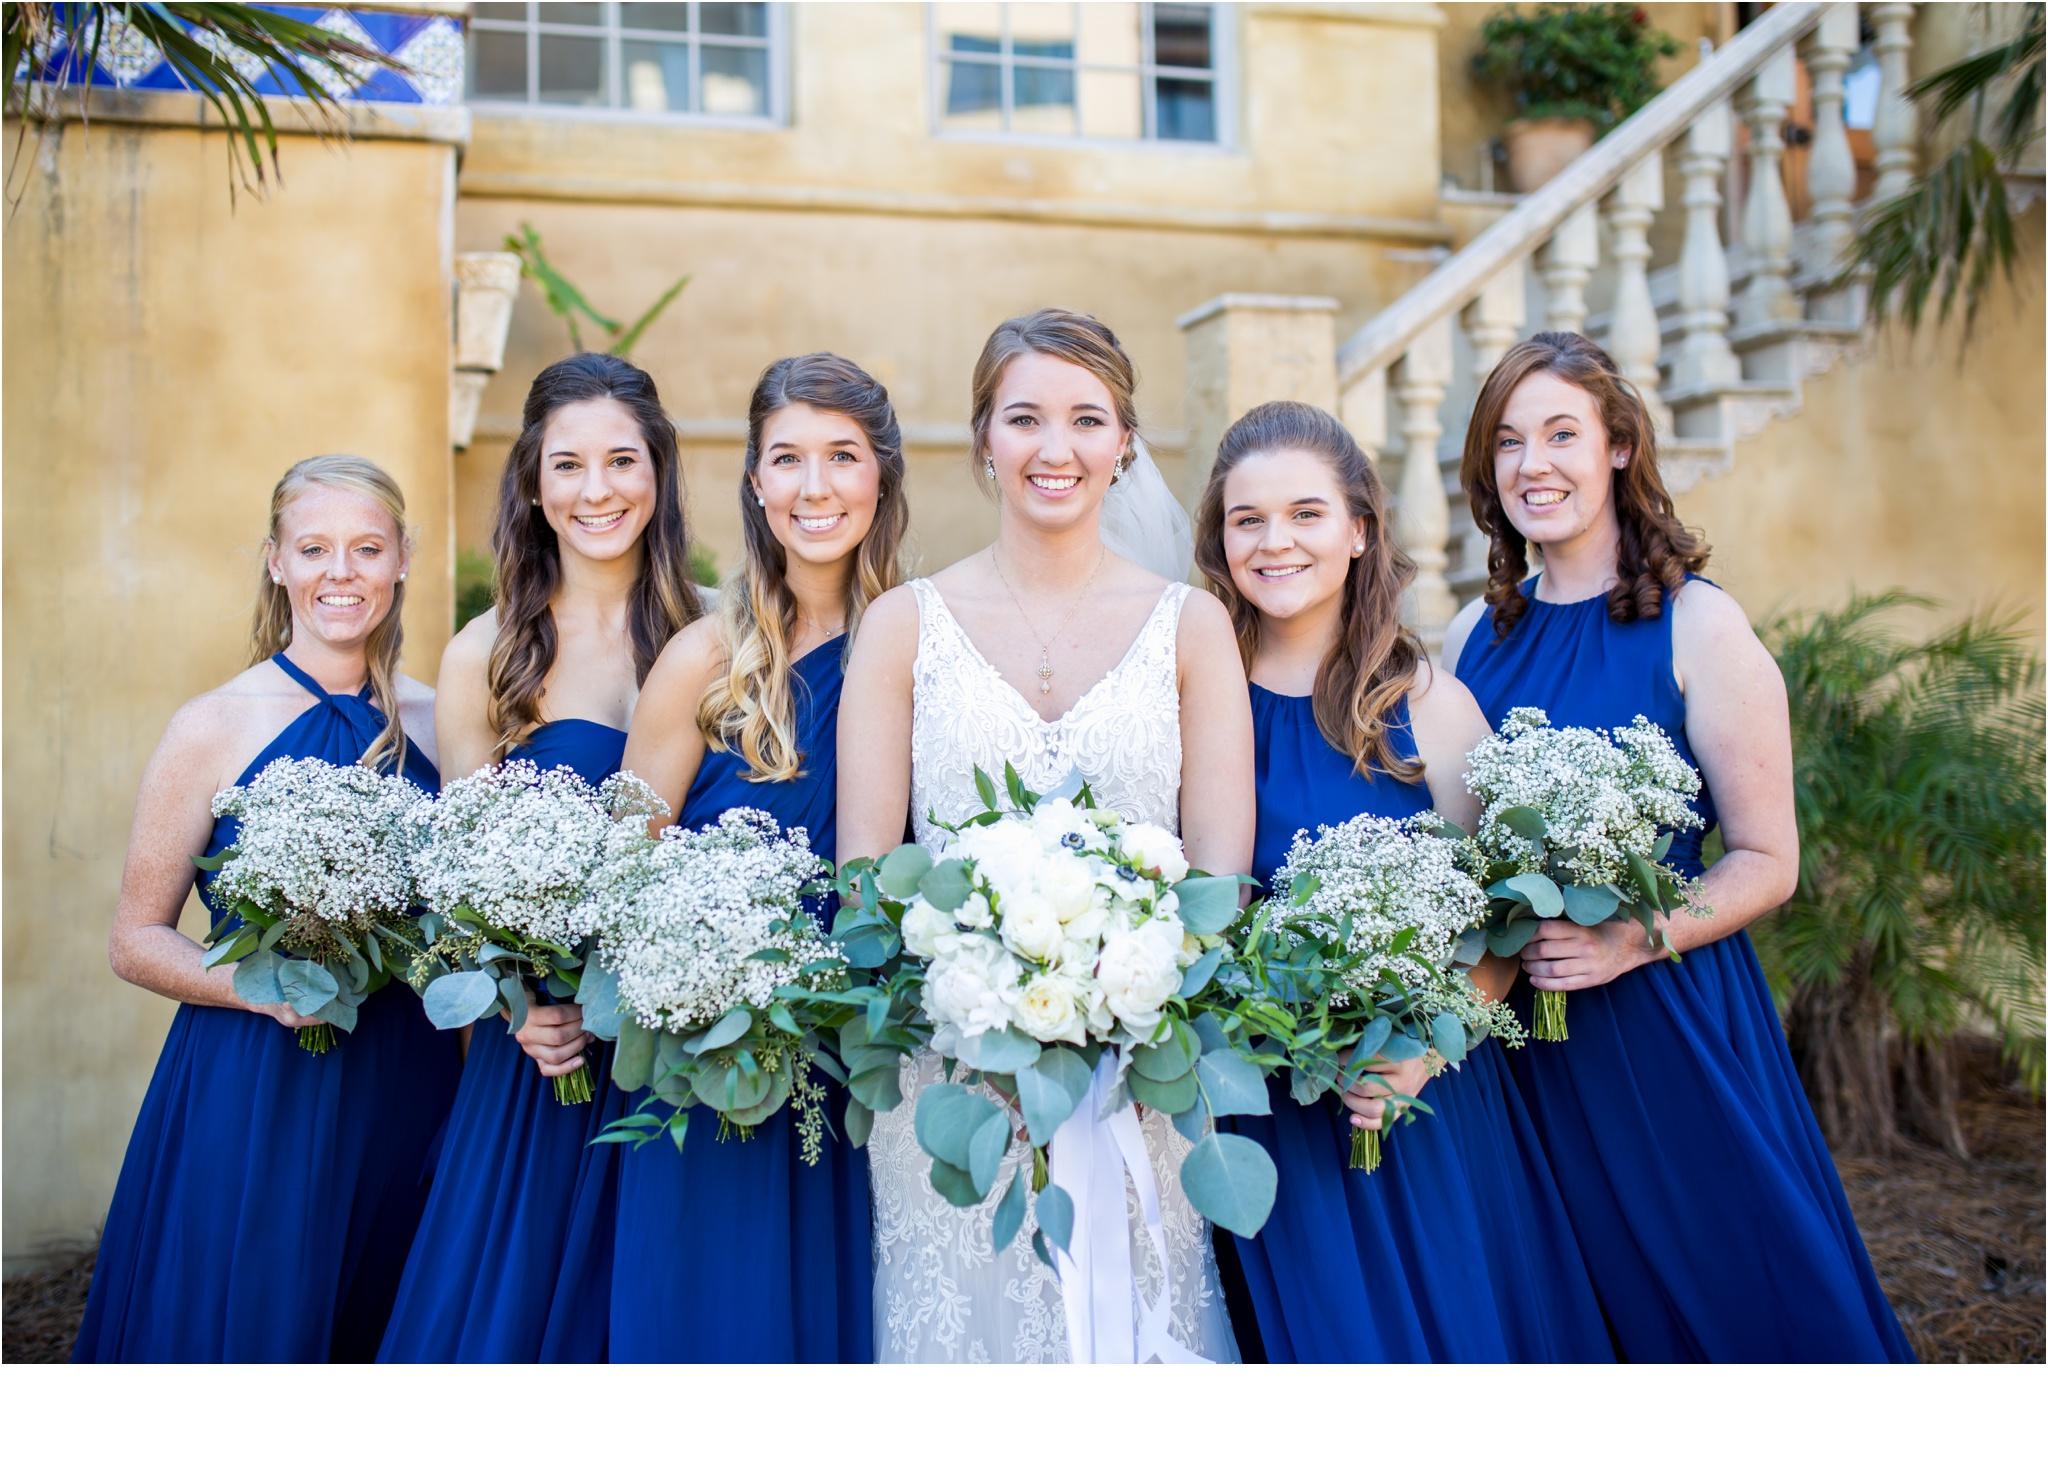 Rainey_Gregg_Photography_St._Simons_Island_Georgia_California_Wedding_Portrait_Photography_0656.jpg